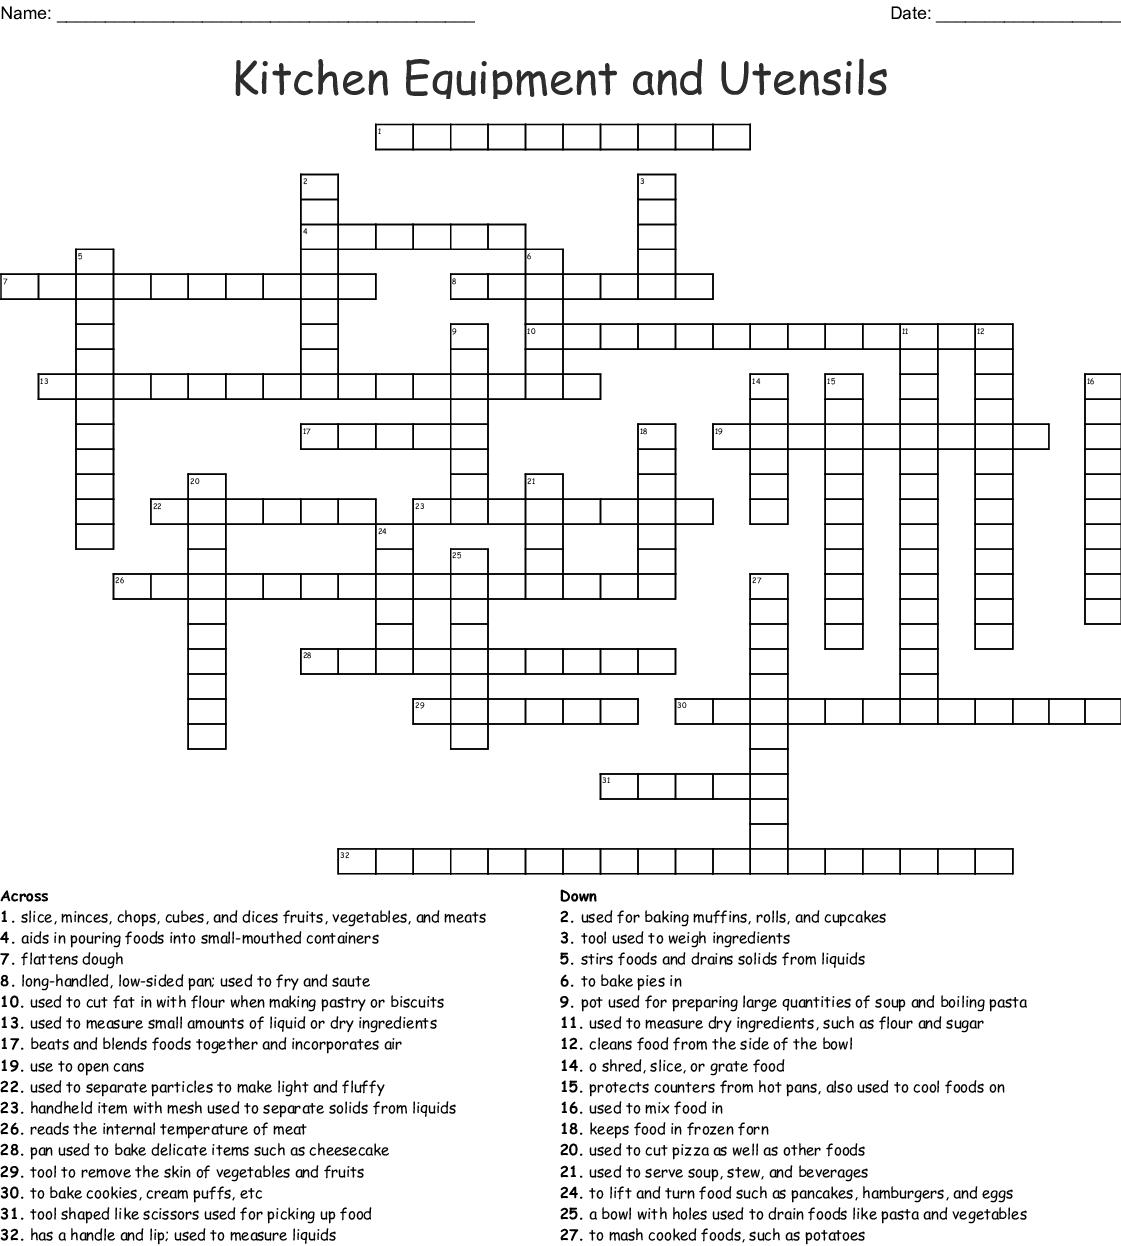 Kitchen Utensils Crossword Activity 1 Answers